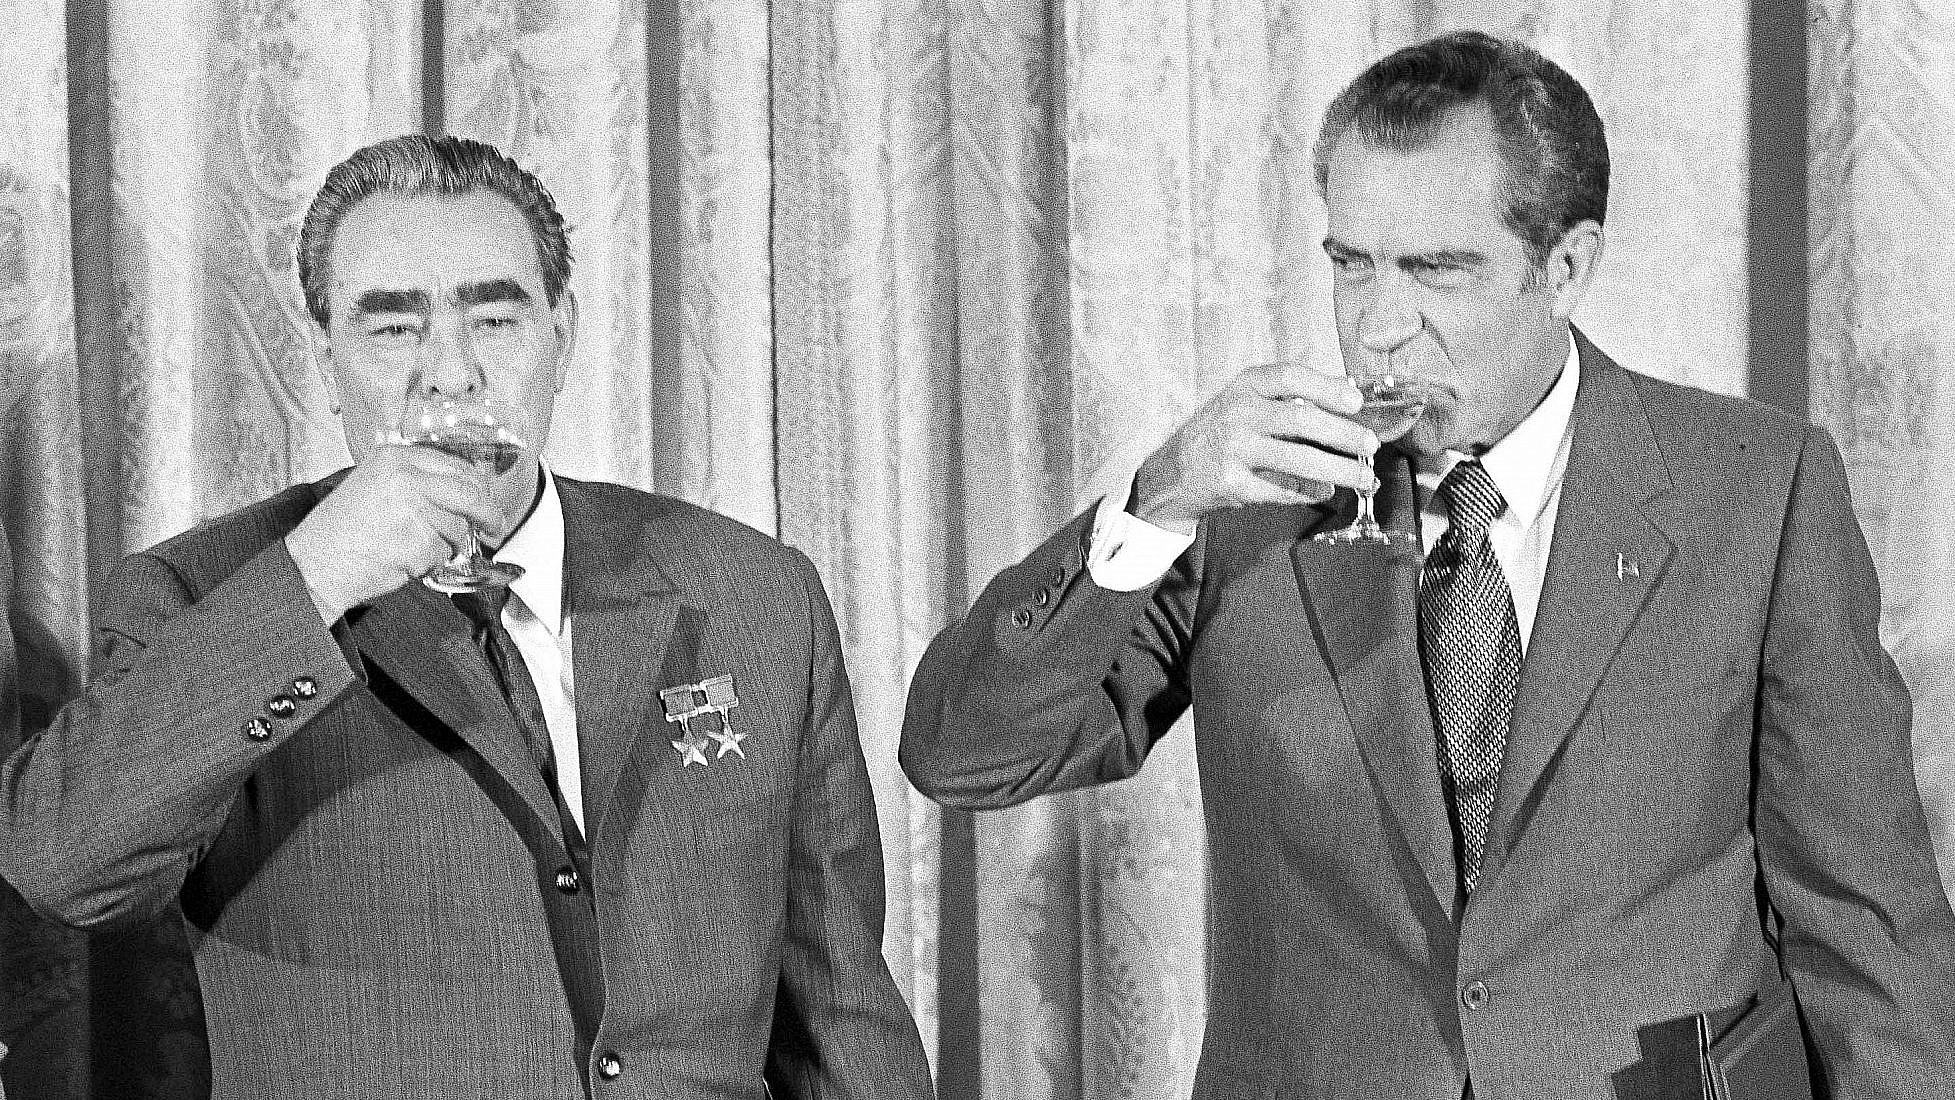 Who Leonid Brezhnev saw as his successor